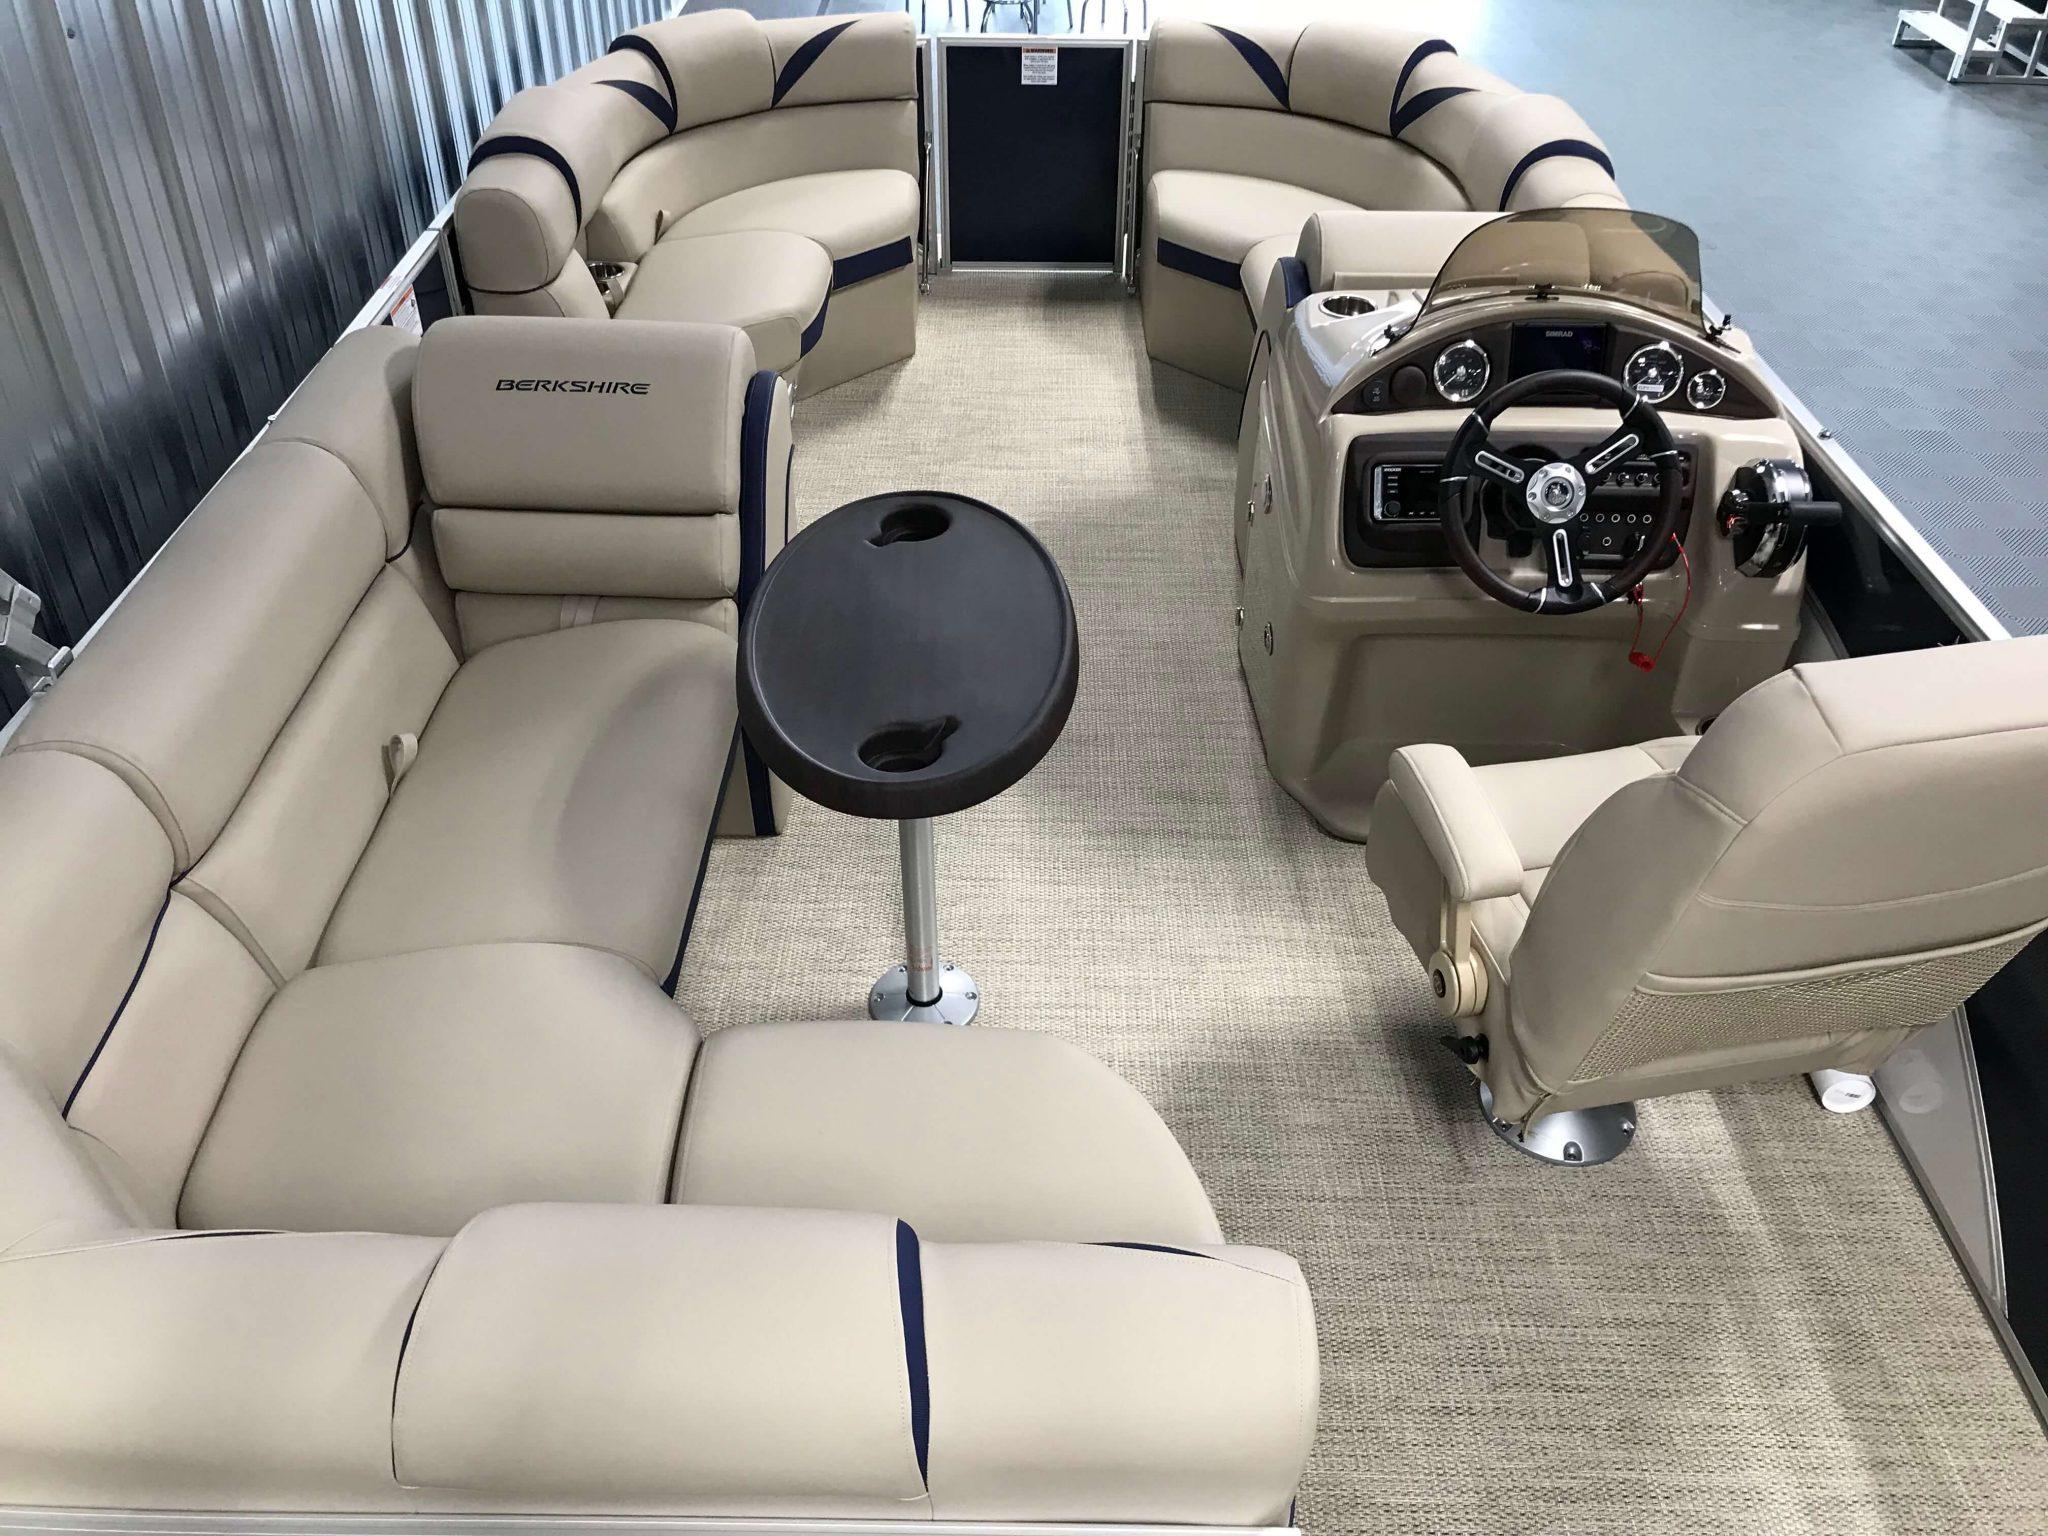 2019 Berkshire 23RFC2 STS Deluxe Pontoon Interior Cockpit Layout 1